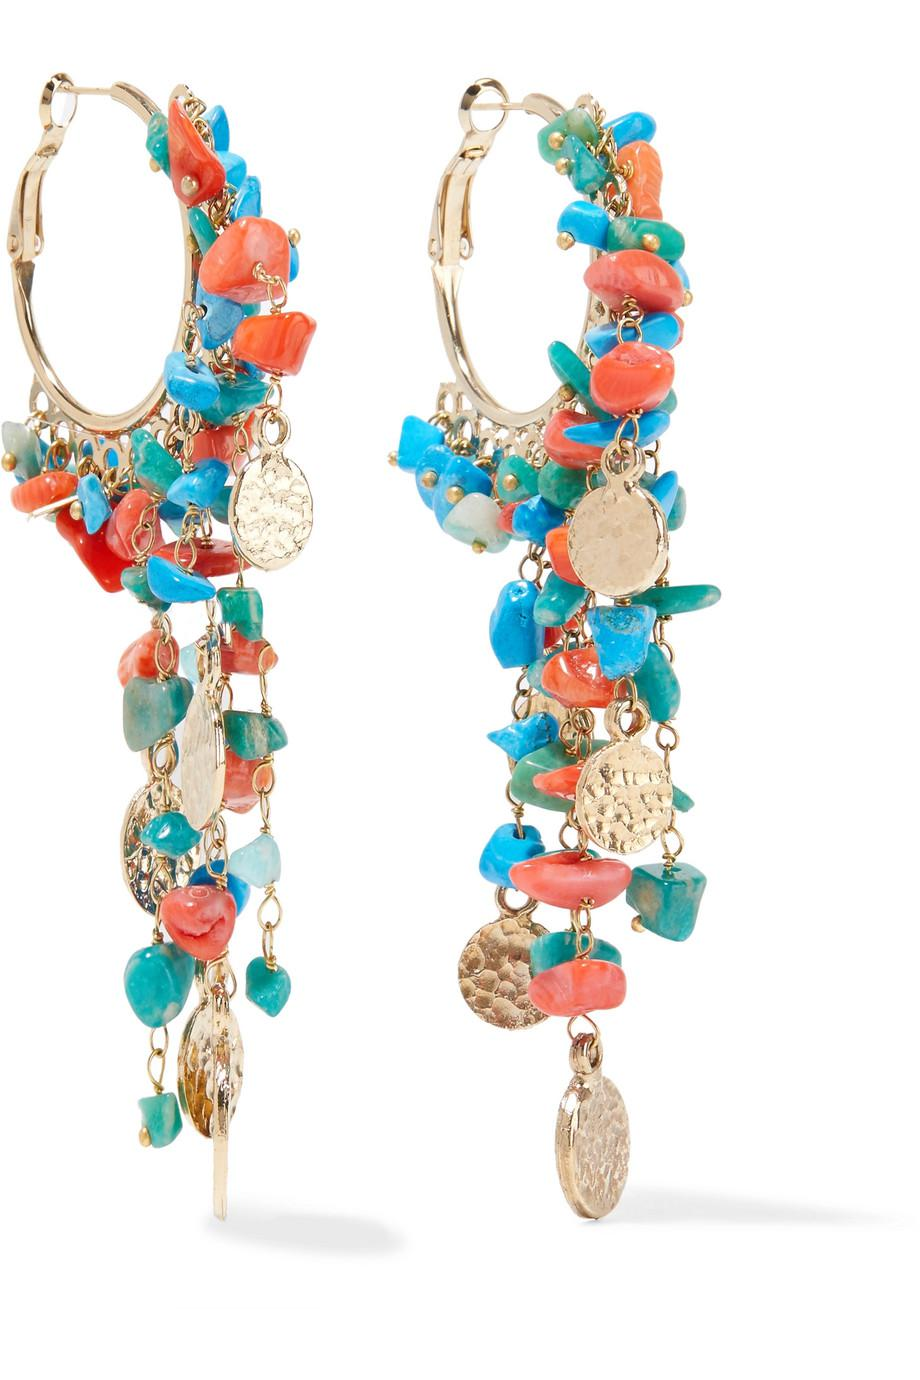 Vento Gold-tone Beaded Hoop Earrings - Blue Rosantica wAYMLfx